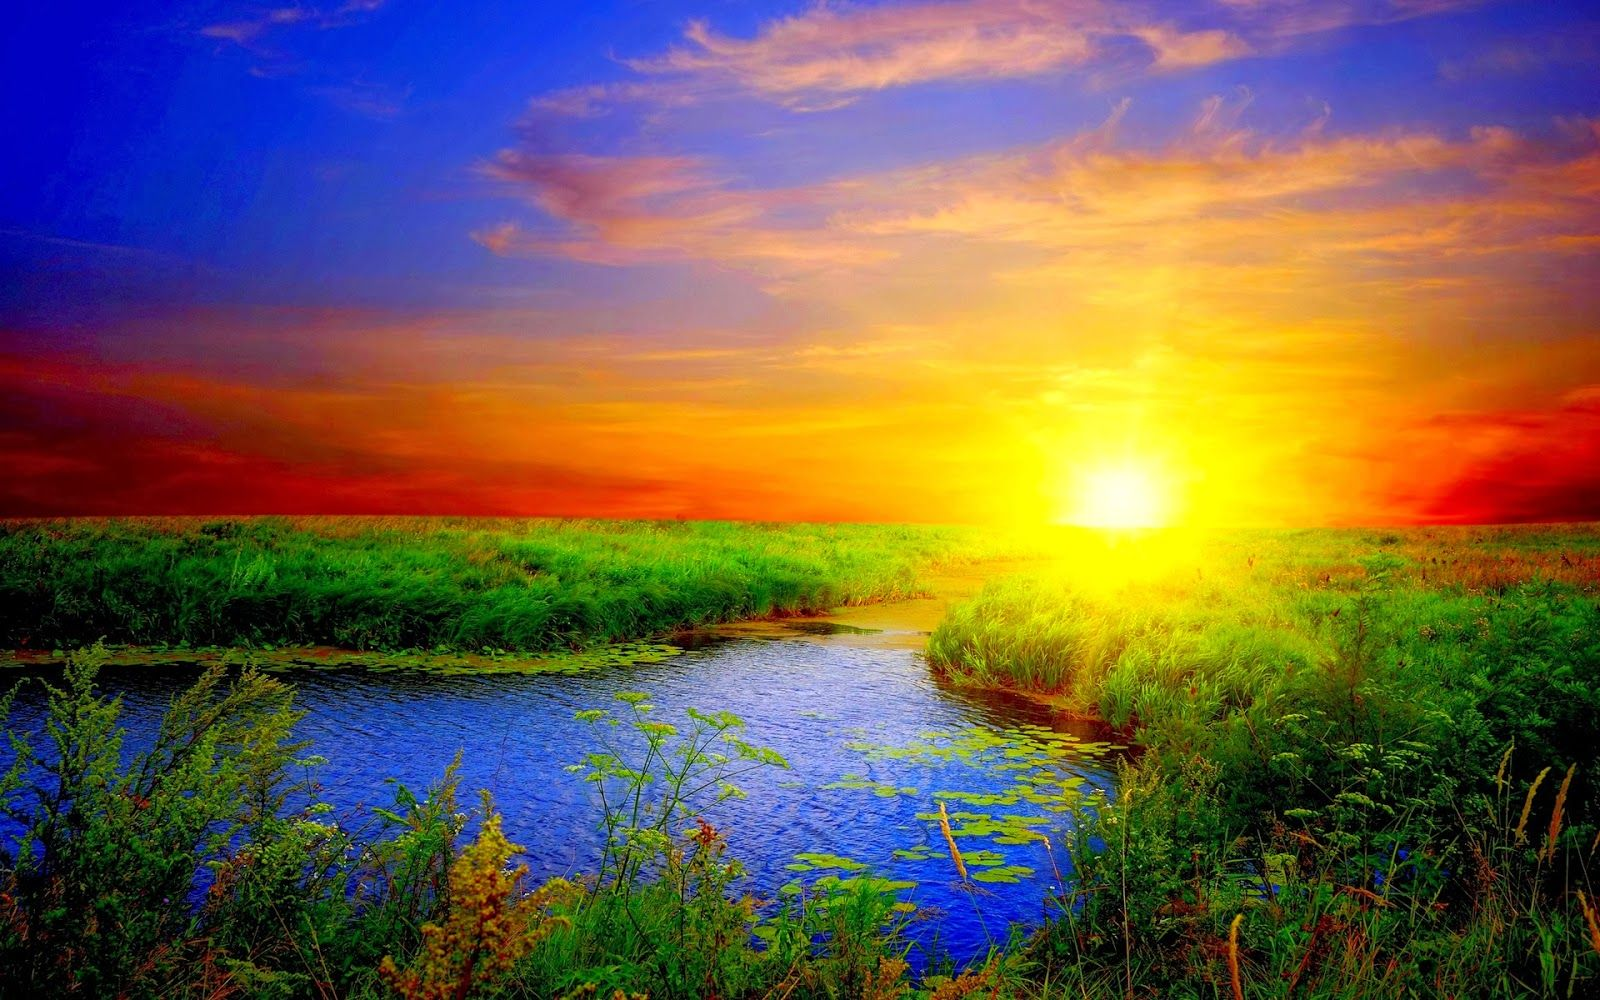 Most Beautiful Pictures of Sunrise | Sunrise